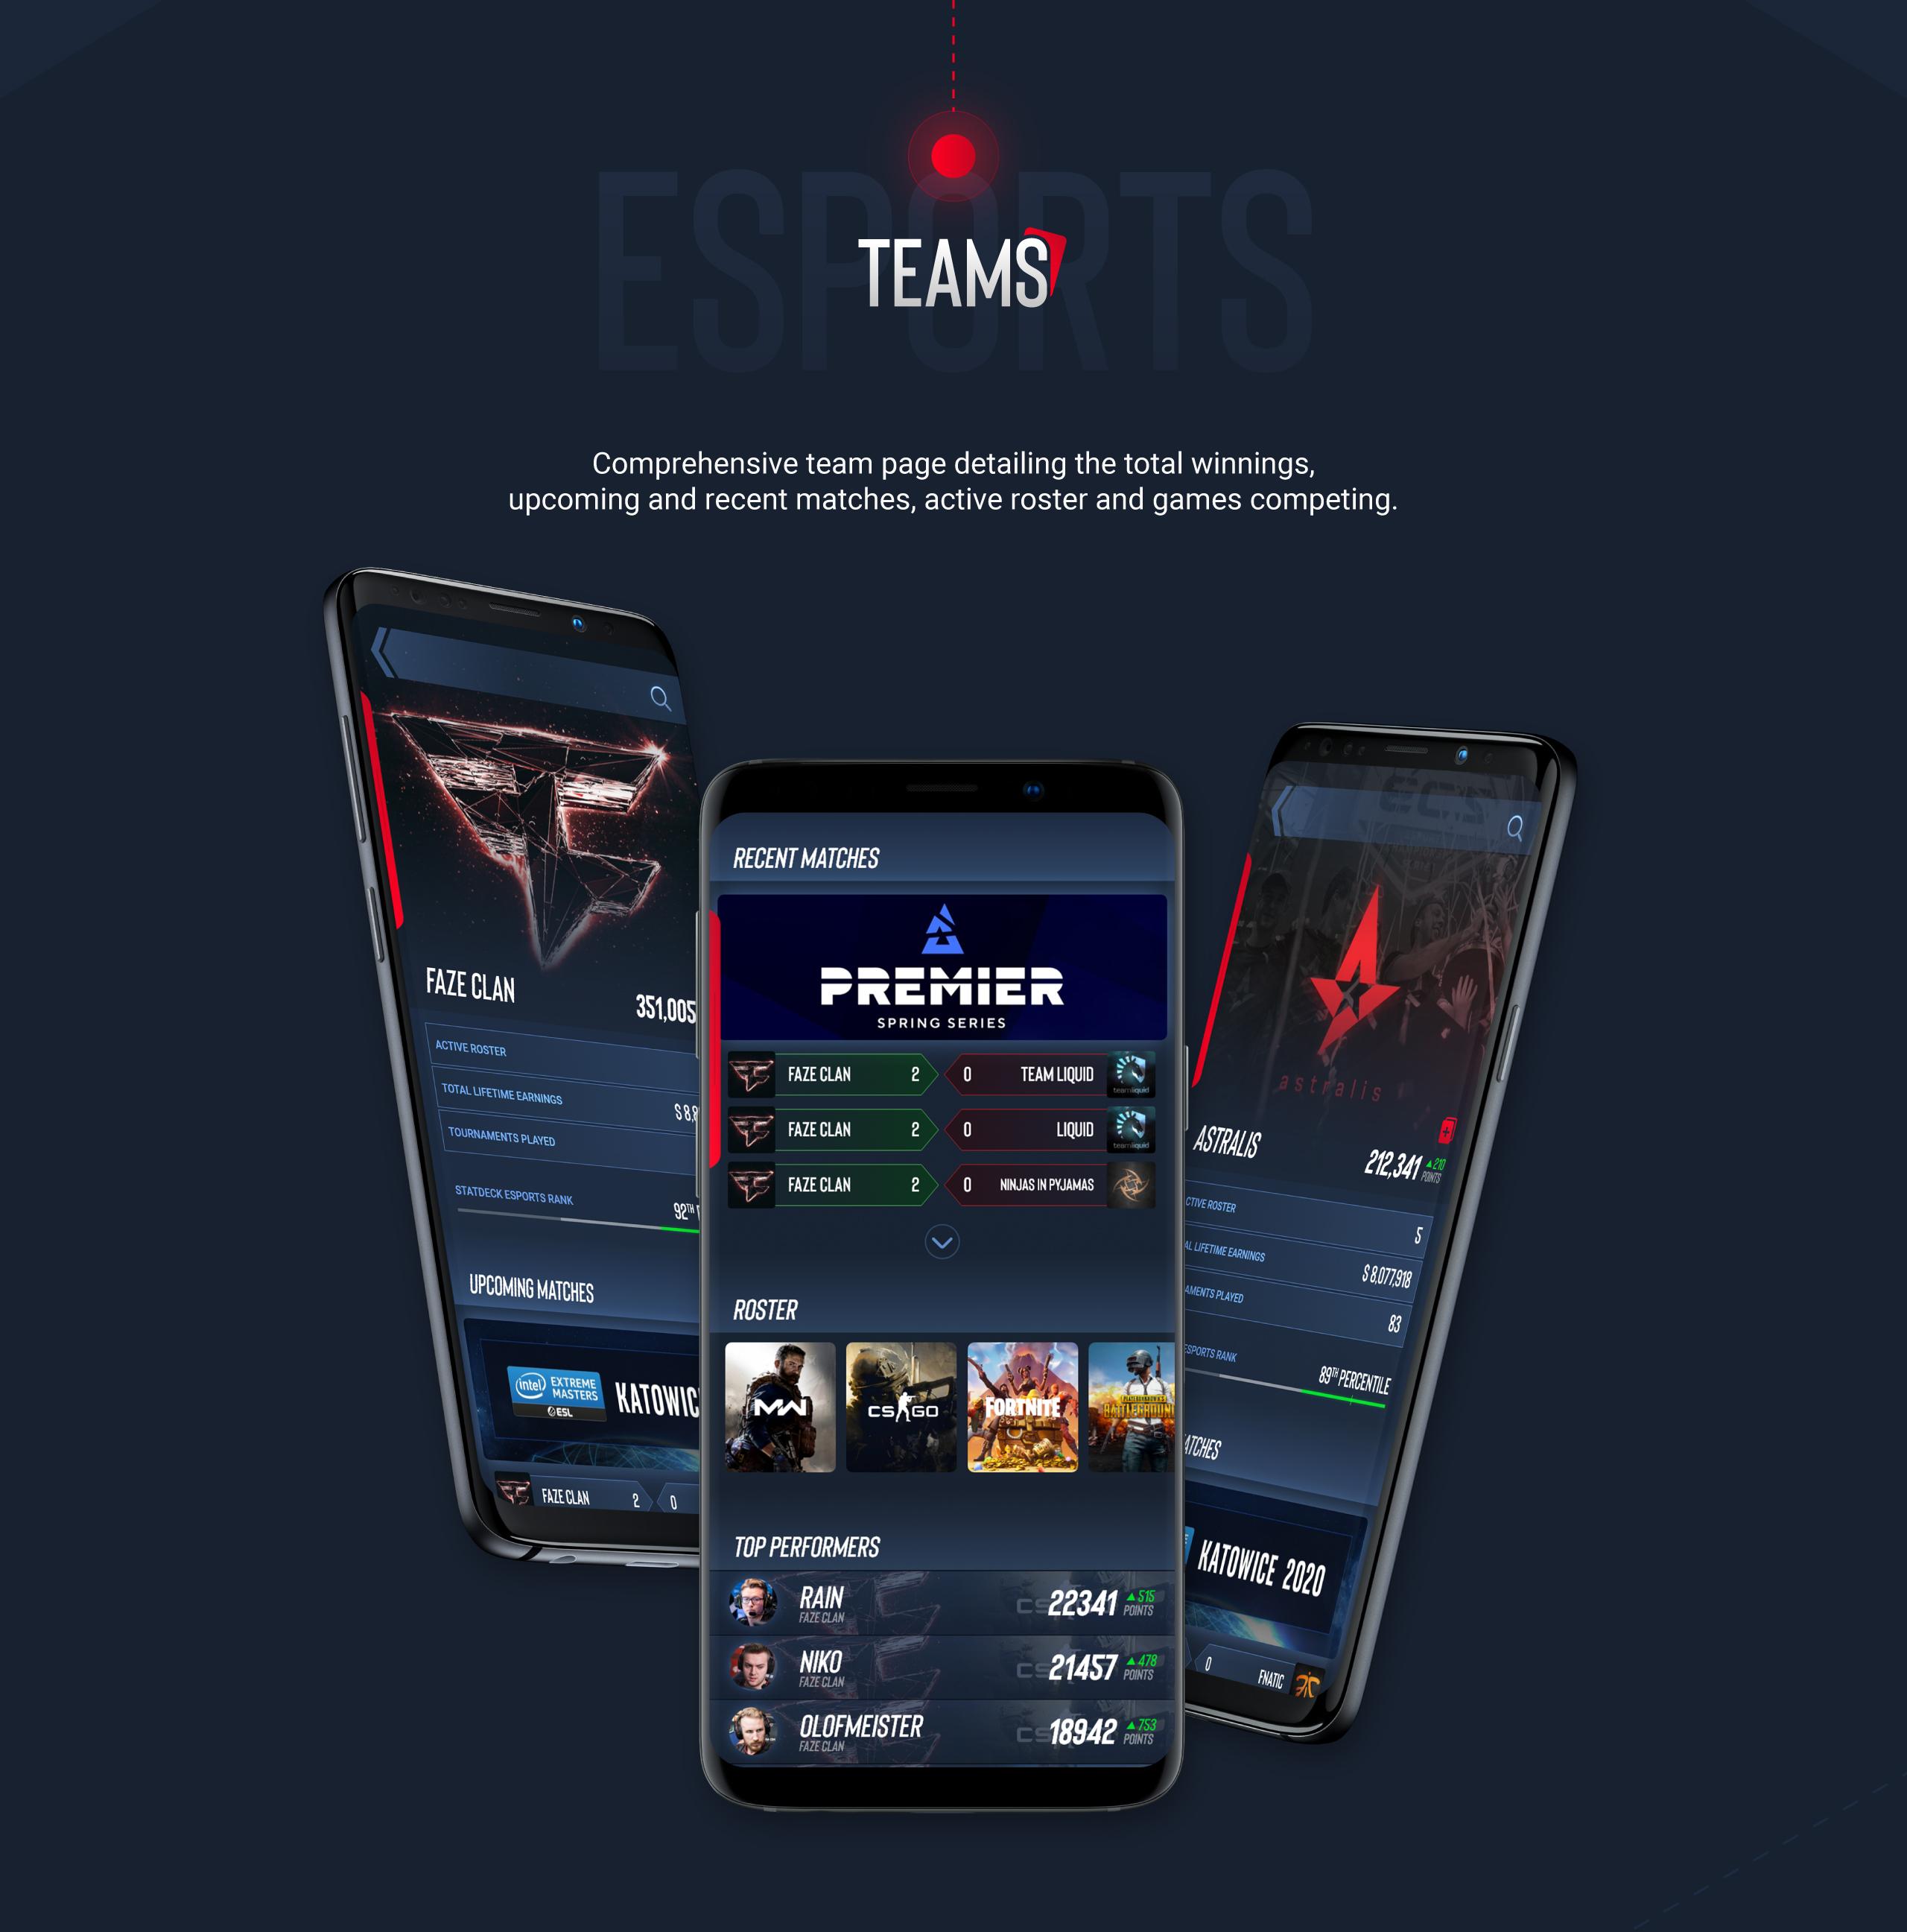 Statdeck screens - eSports teams